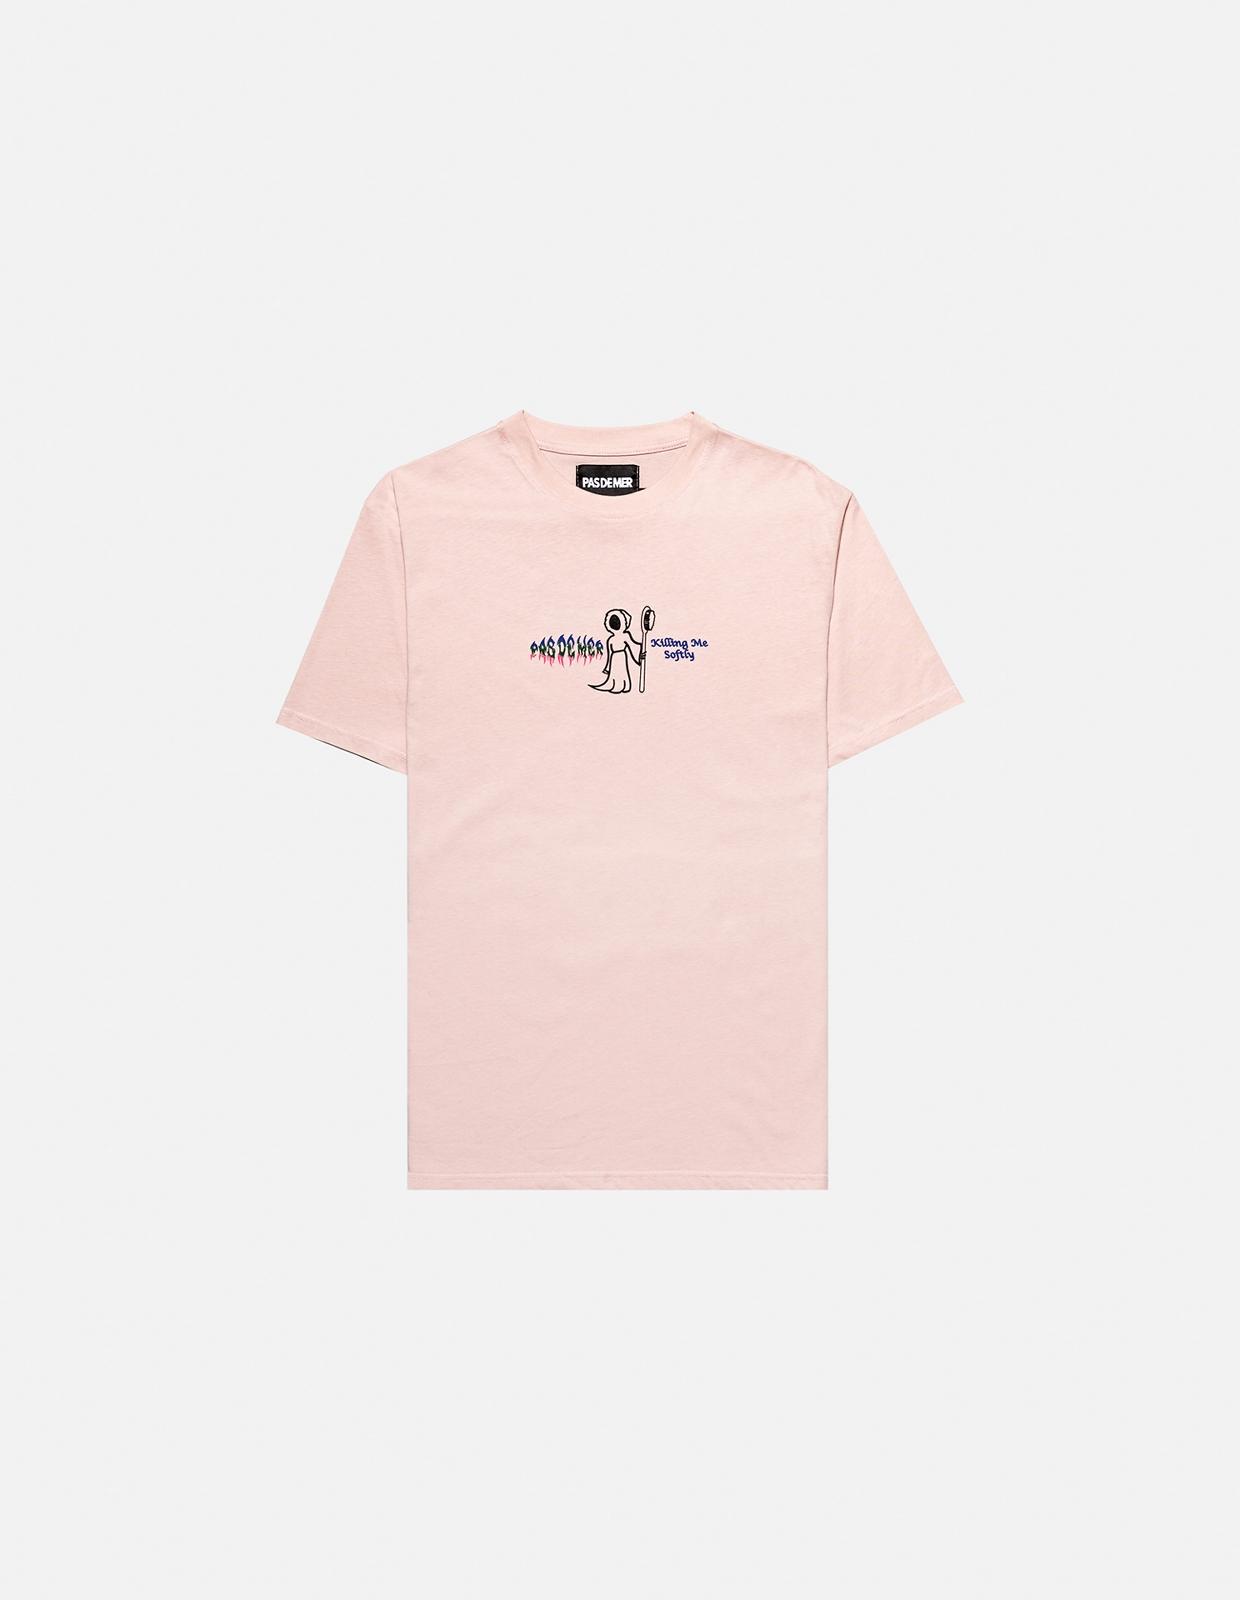 【PAS DE MER/パドゥメ】KILLING ME T-SHIRT Tシャツ / PINK